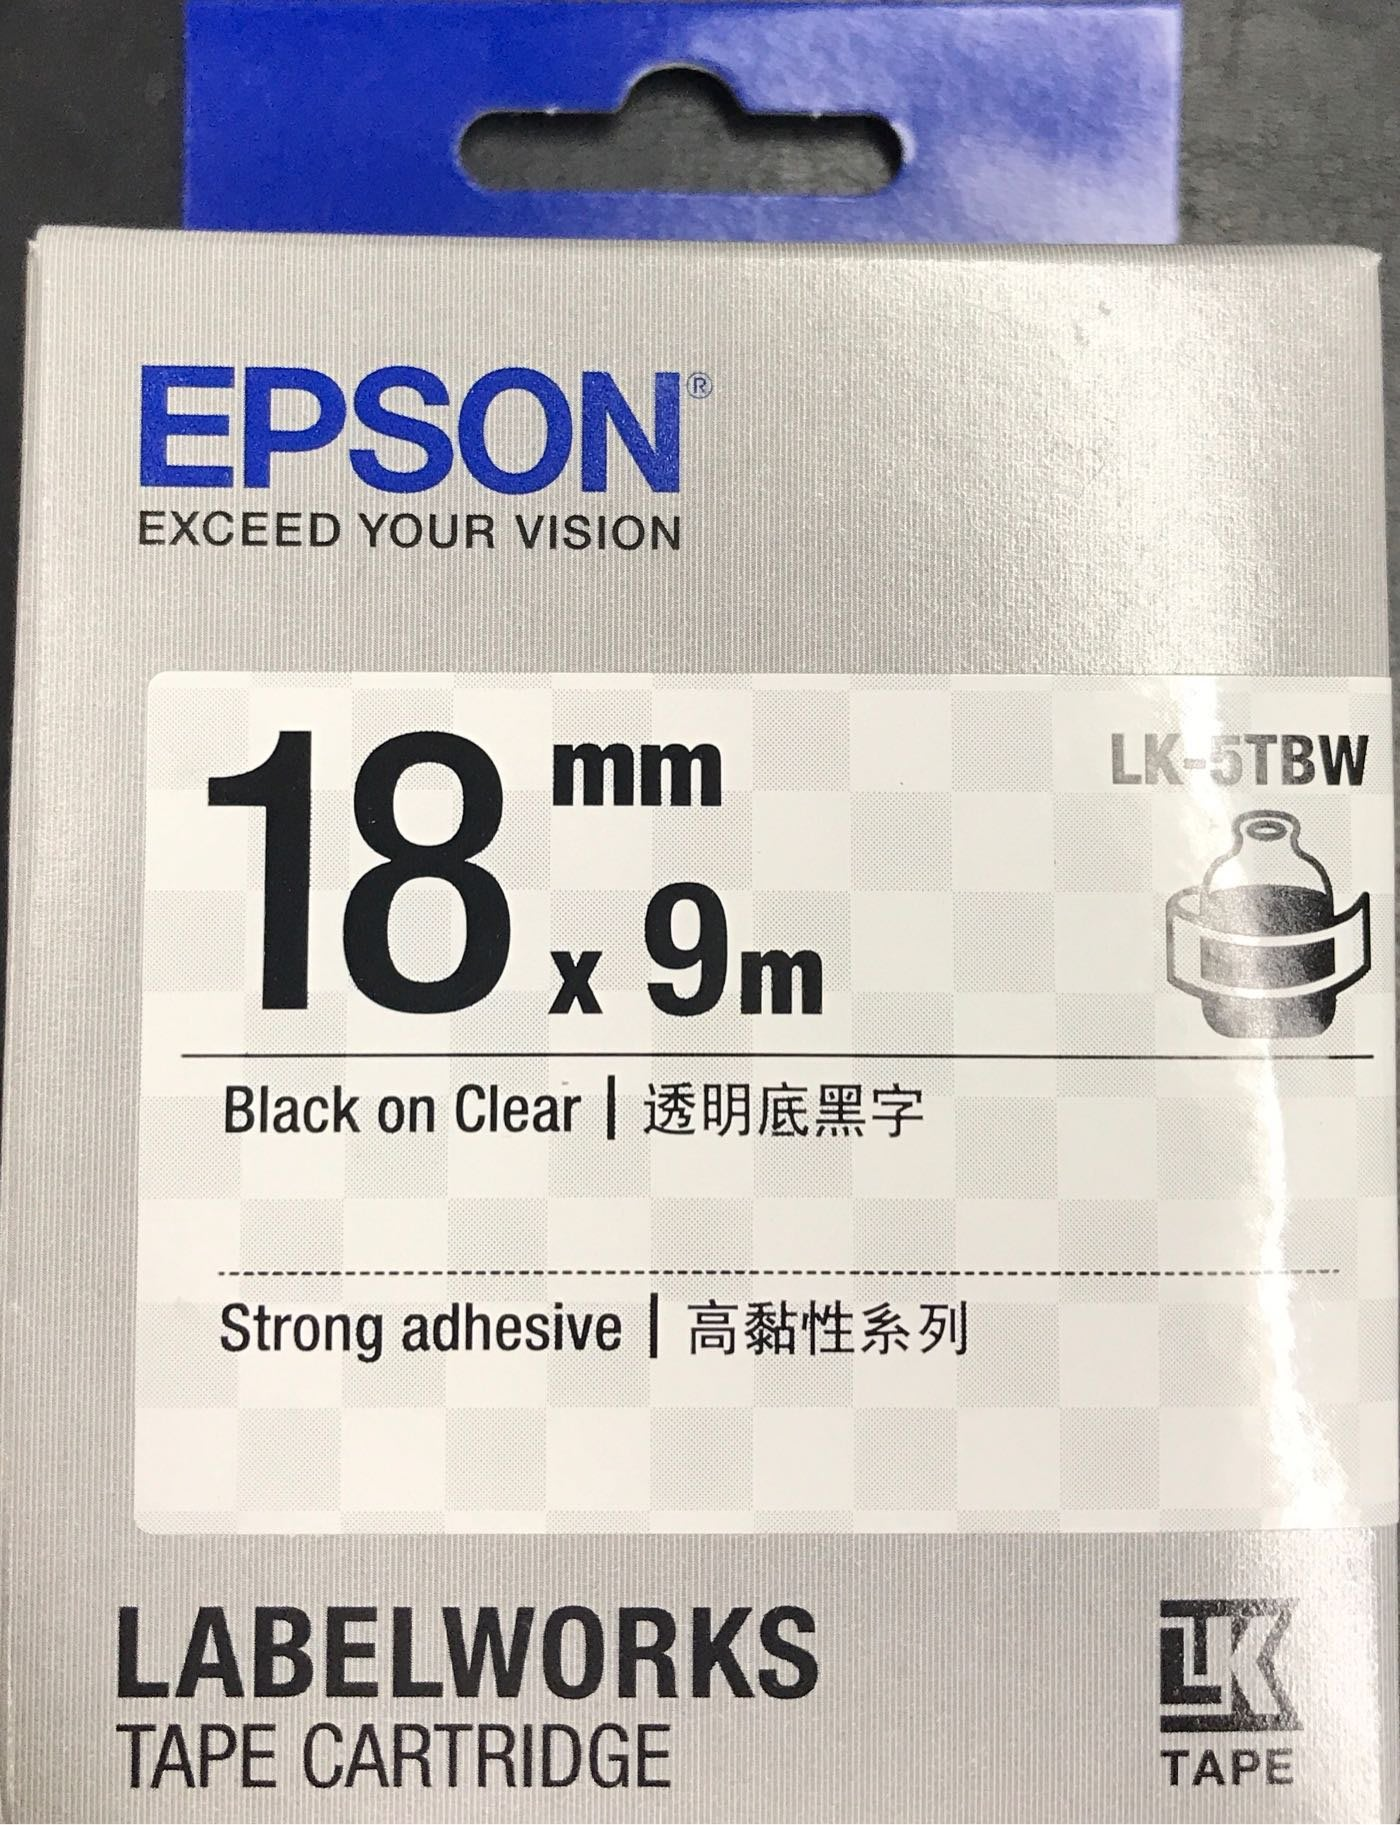 EPSON愛普生 18mm *9m 原廠標籤機色帶 高黏性系列 LK-5TBW. 透明底黑字